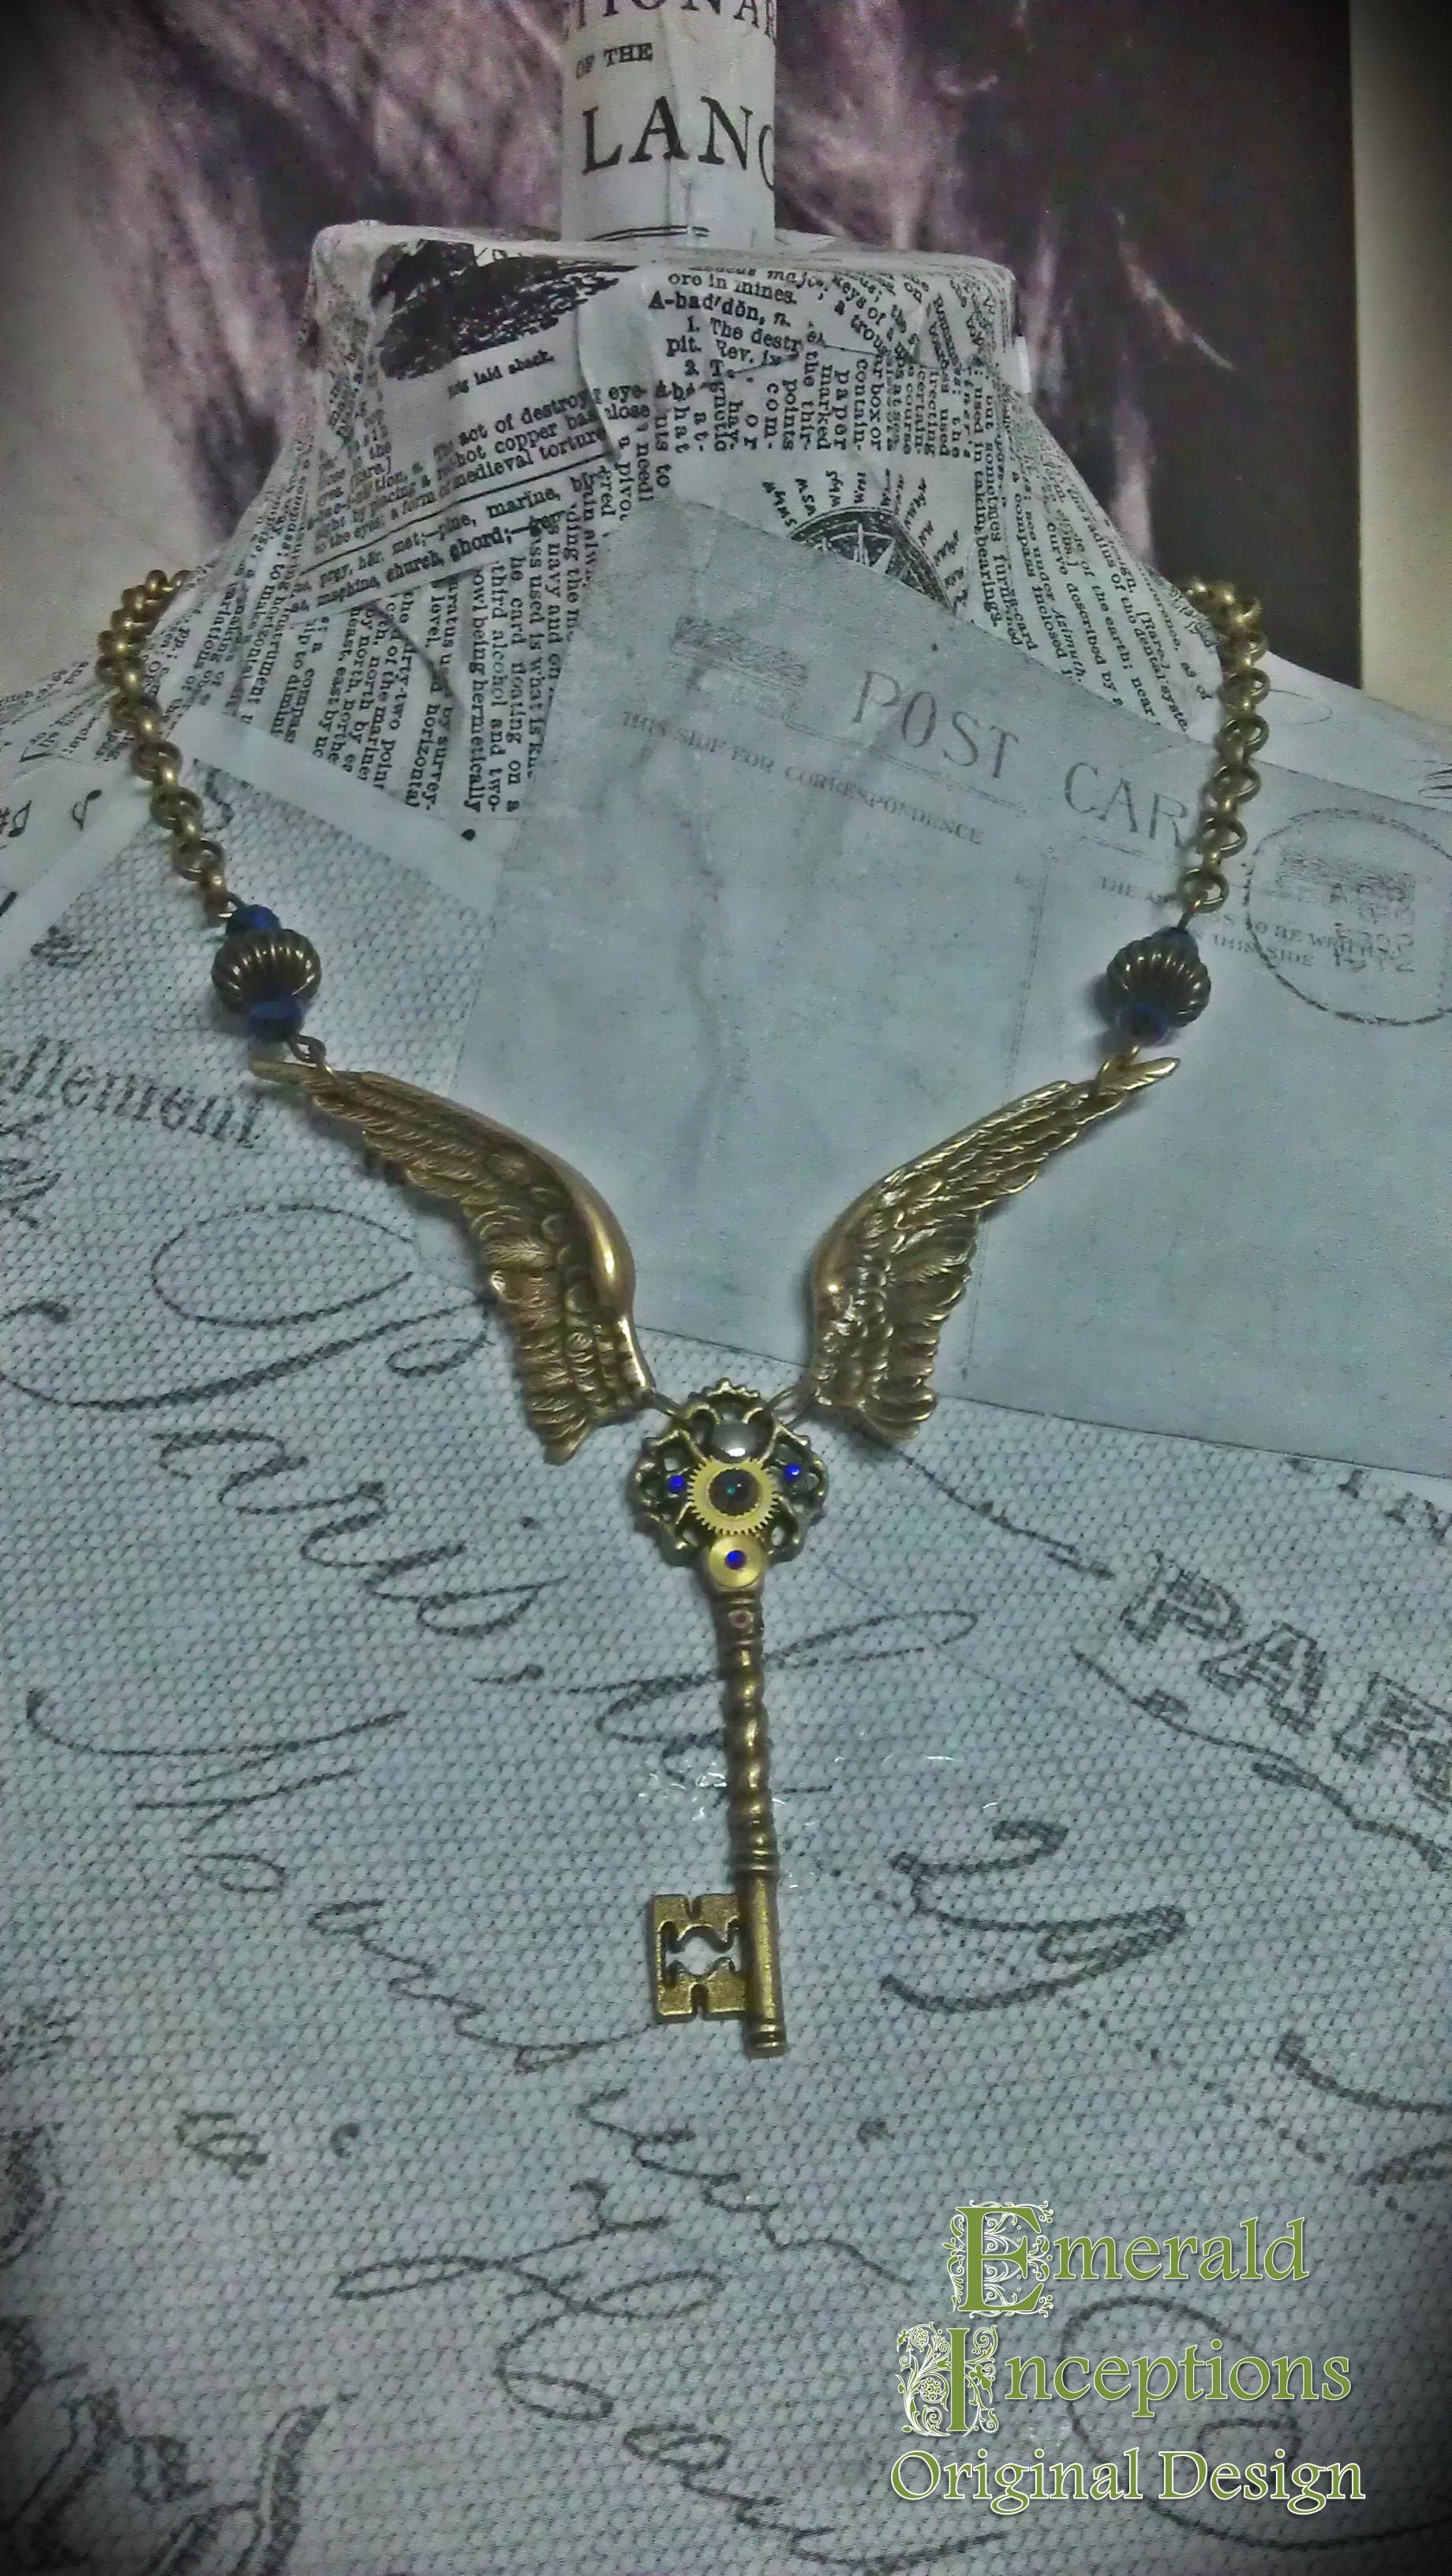 st_peters_stolen_key_steampunk_necklace_necklaces_3.jpg